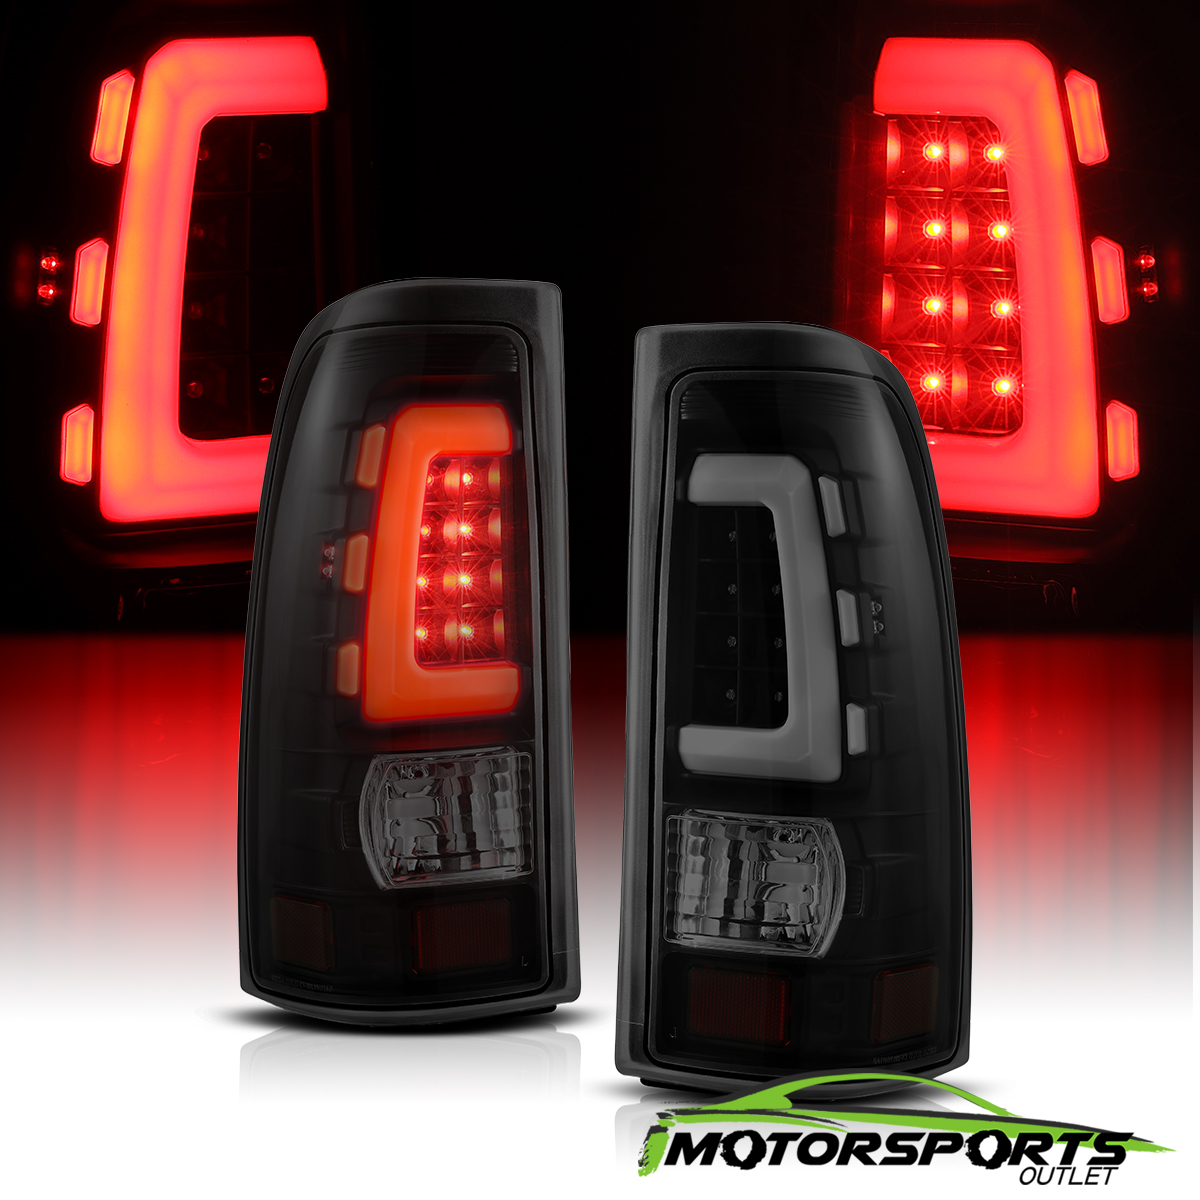 2500 tail light right passenger New 1999 2000 2001 2002 Chevy Silverado 1500